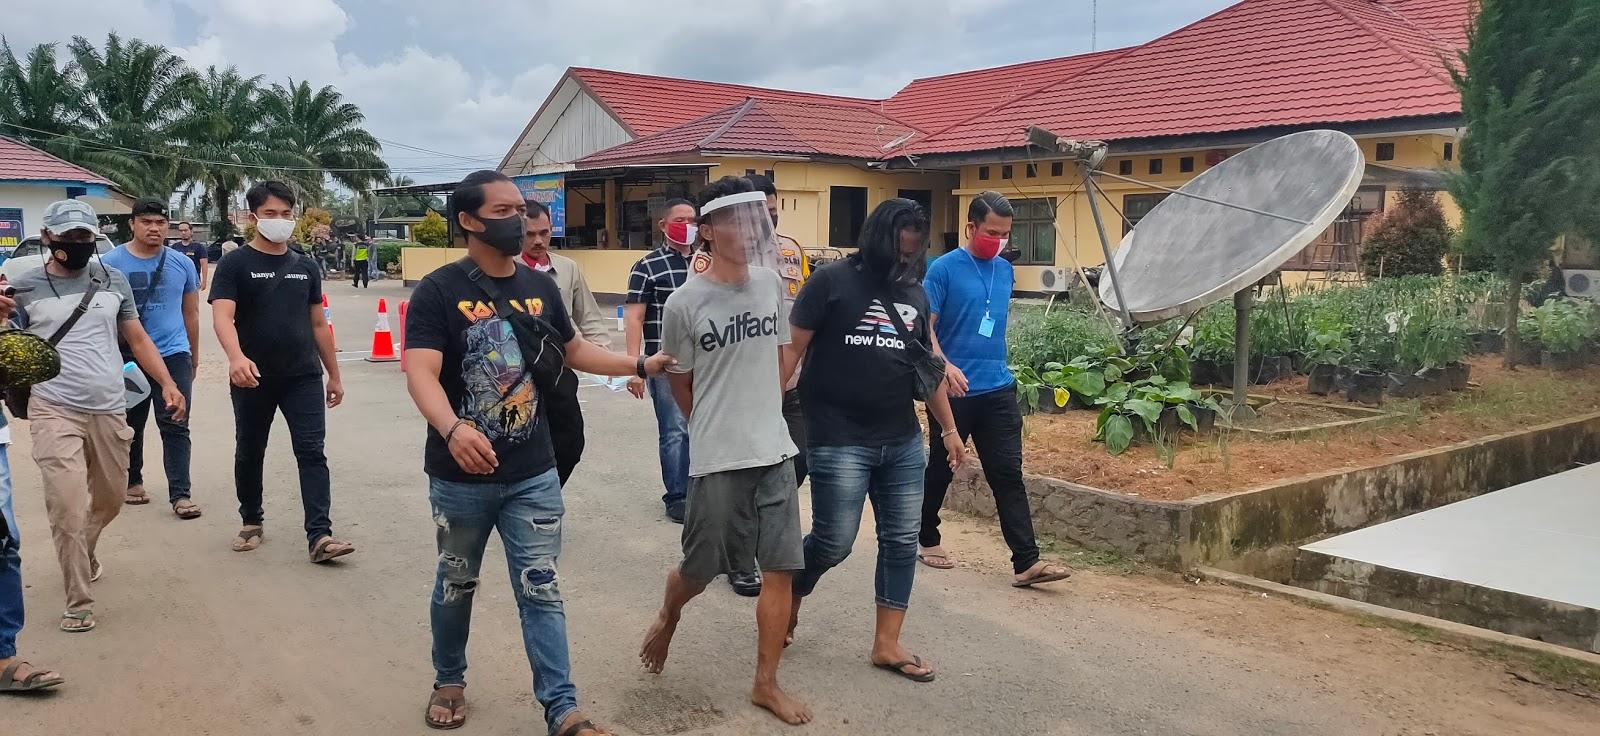 Pelaku Pembunuhan di Desa Alang-Alang Akhirnya Tertangkap